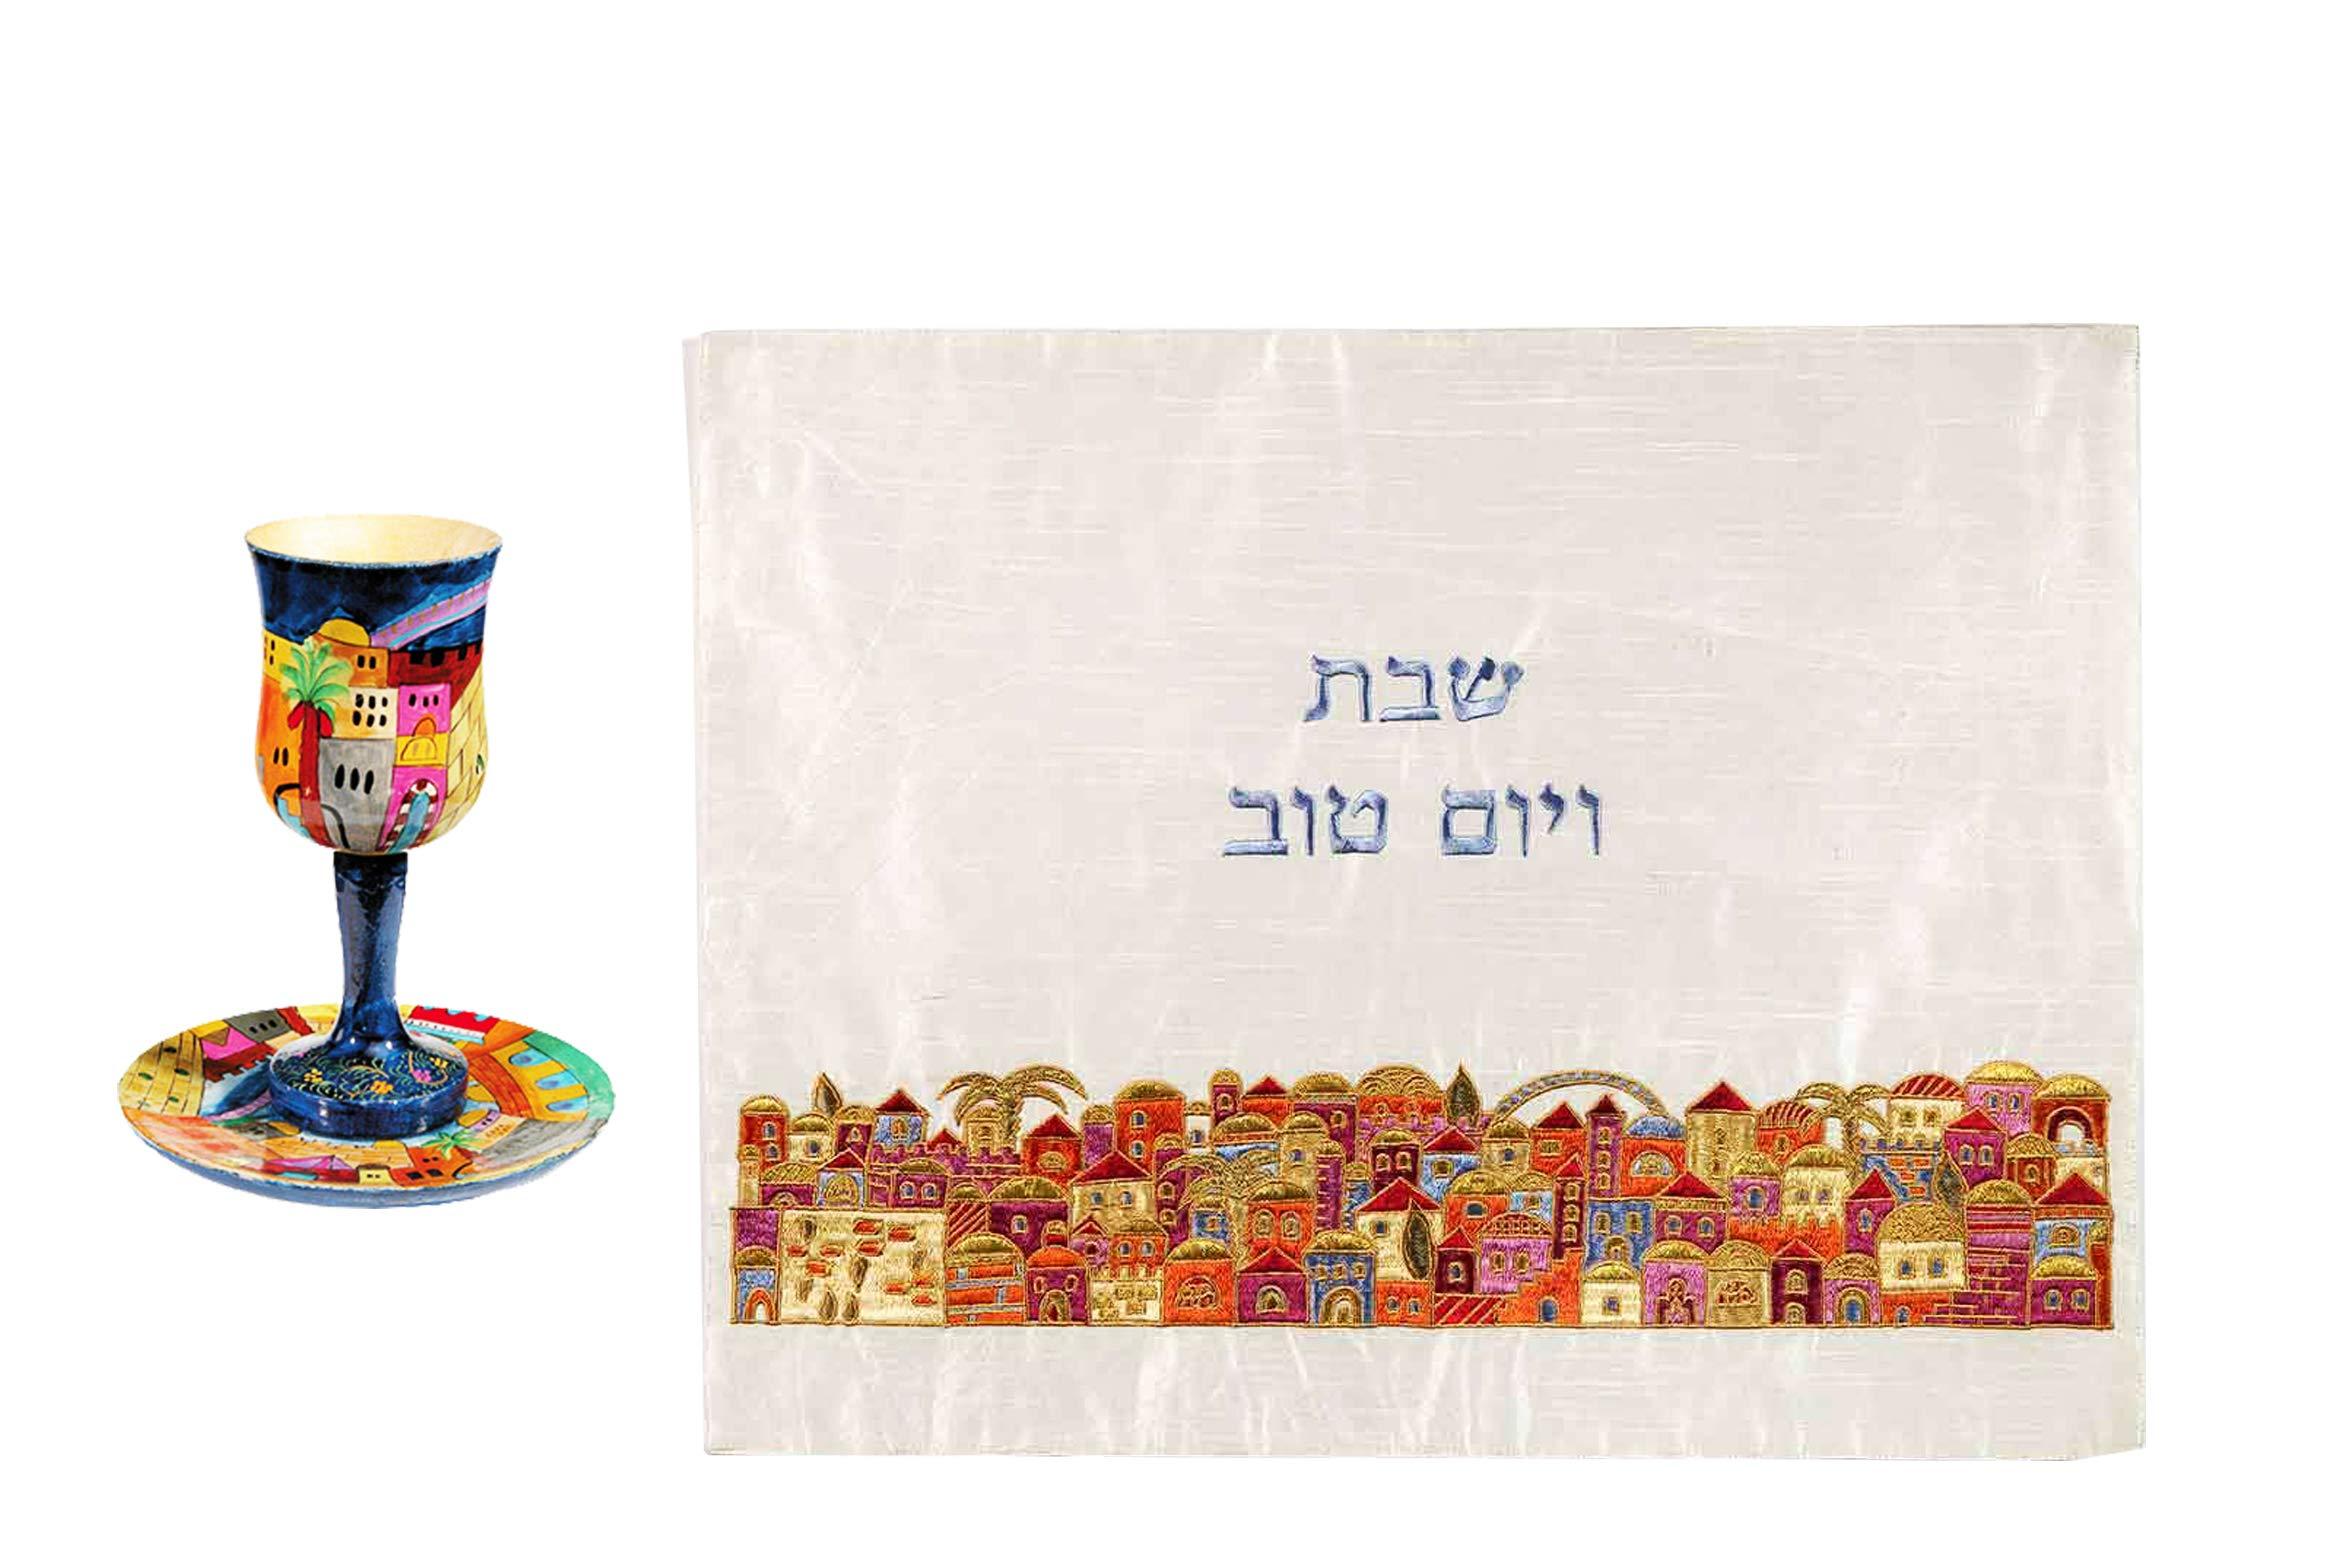 Yair Emanuel Silk Jerusalem Challah Cover & Kiddush Cup Set for Shabbat Jewish Wedding or Bar Mitzvah & Bat Mitzvah Gift. by Yair Emanuel (Image #1)